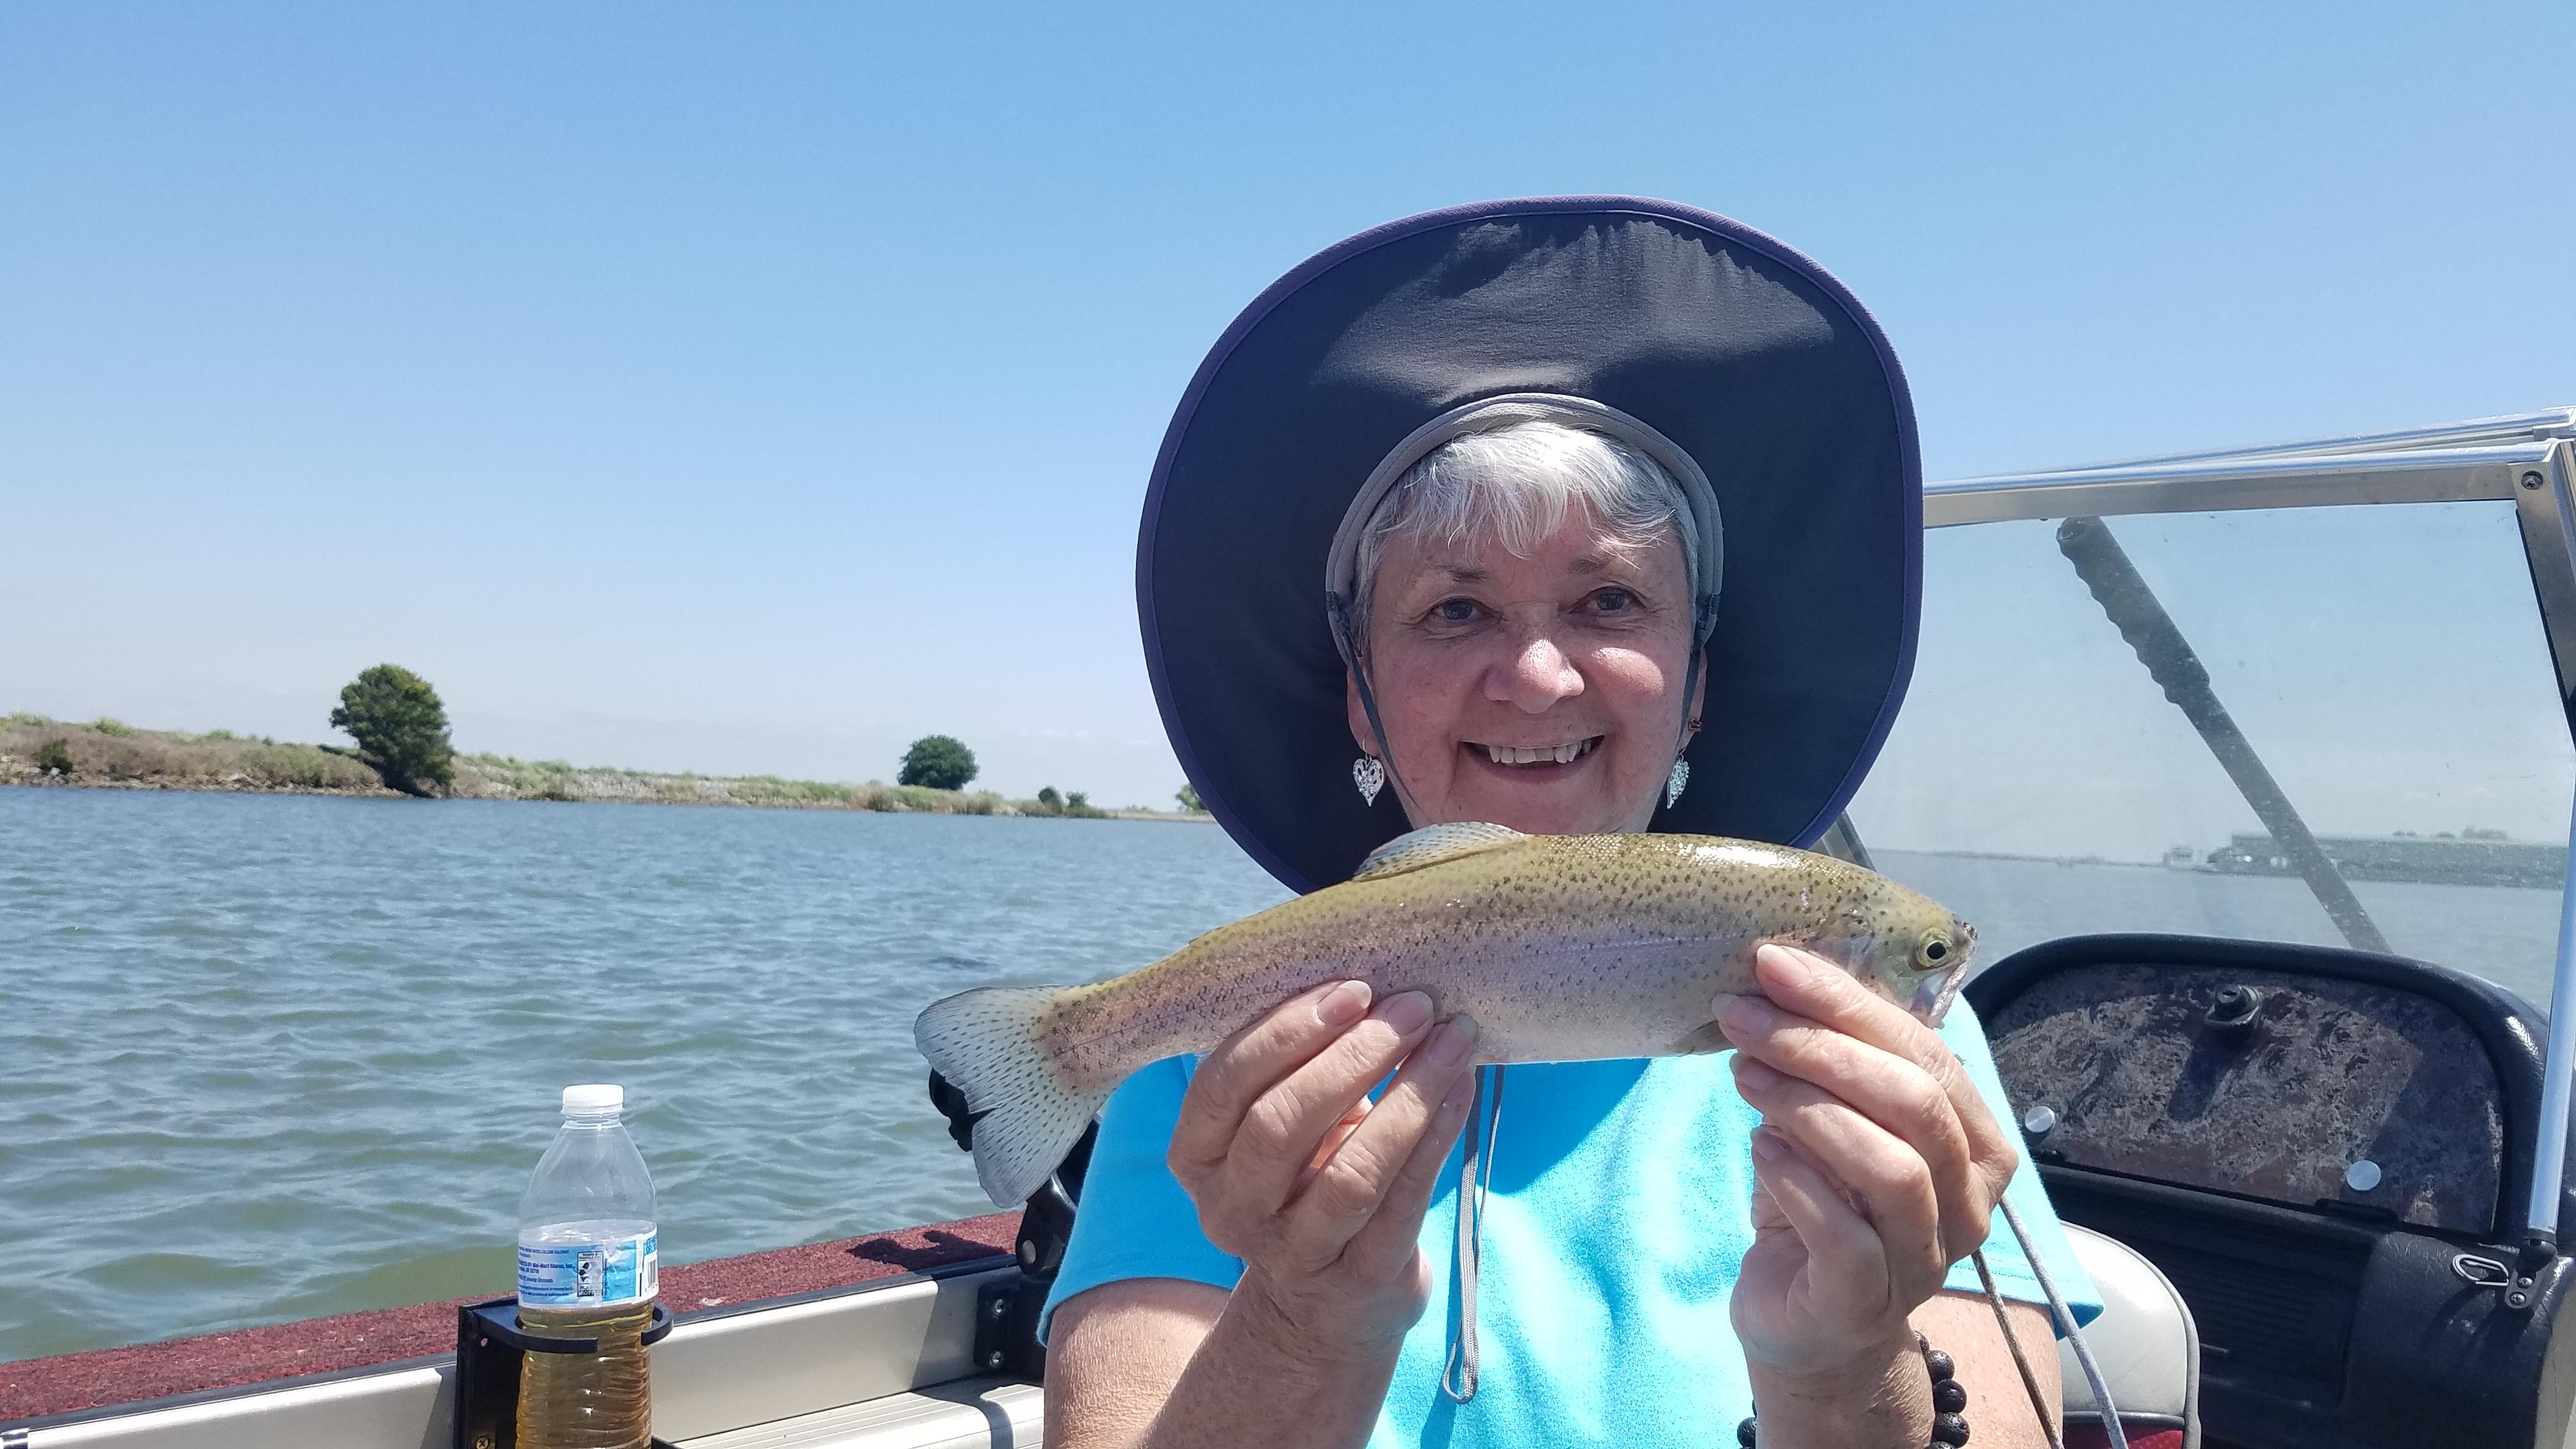 Friend caught a fish!